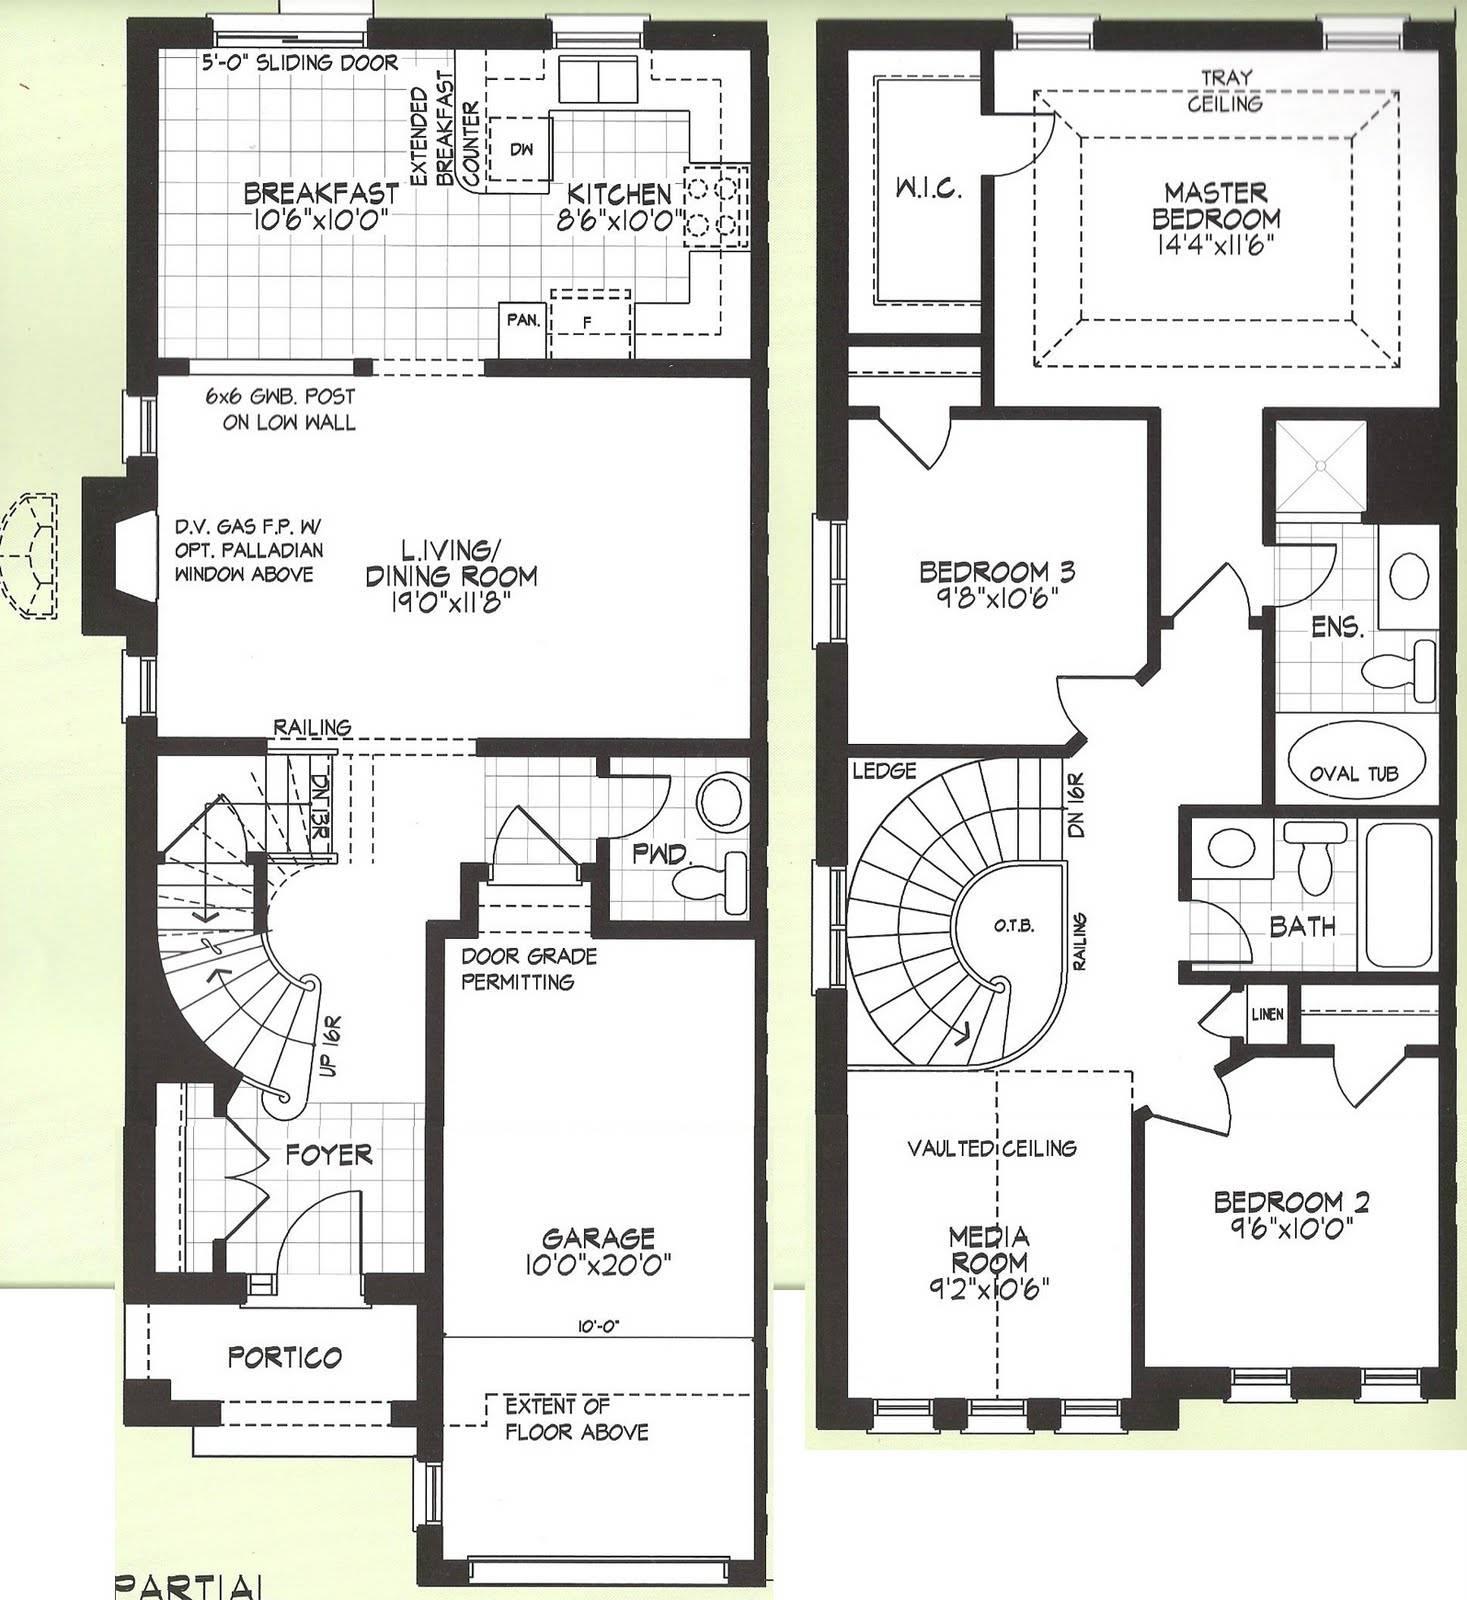 Eames House Floor Plan Interior Decorating Ideas